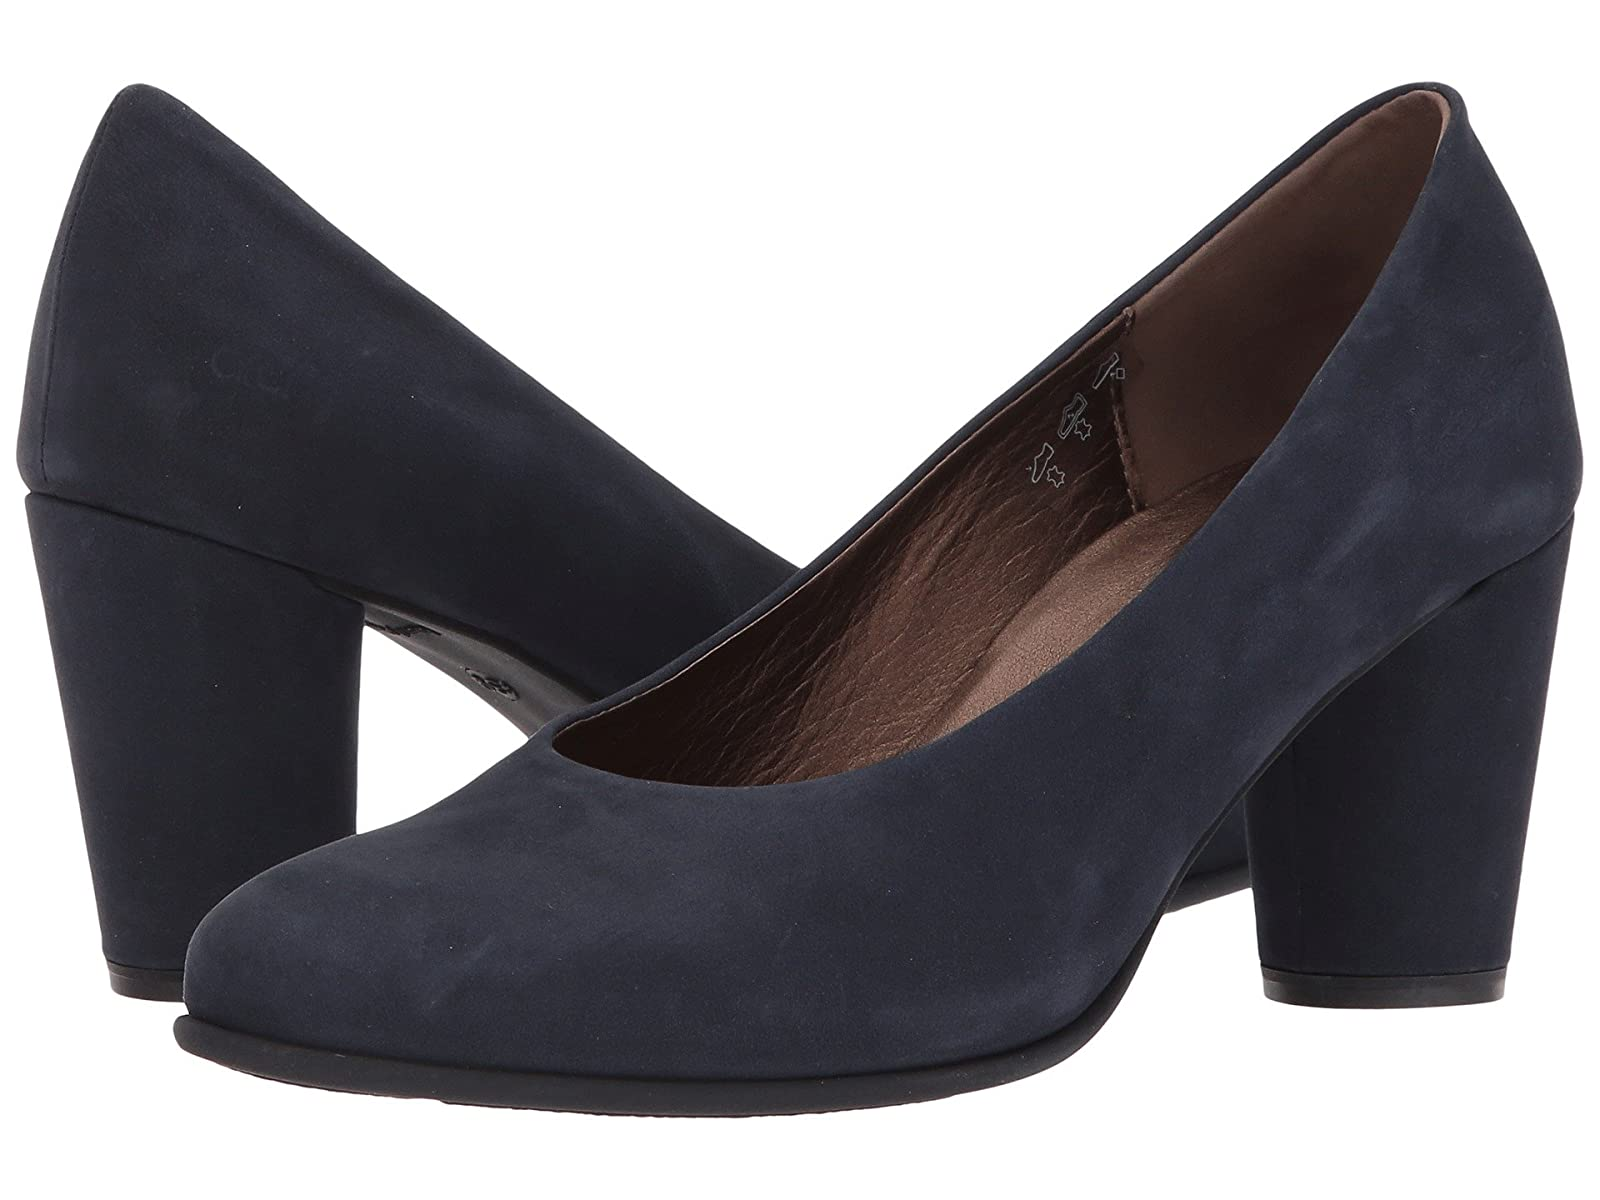 Arche KloemiAtmospheric grades have affordable shoes